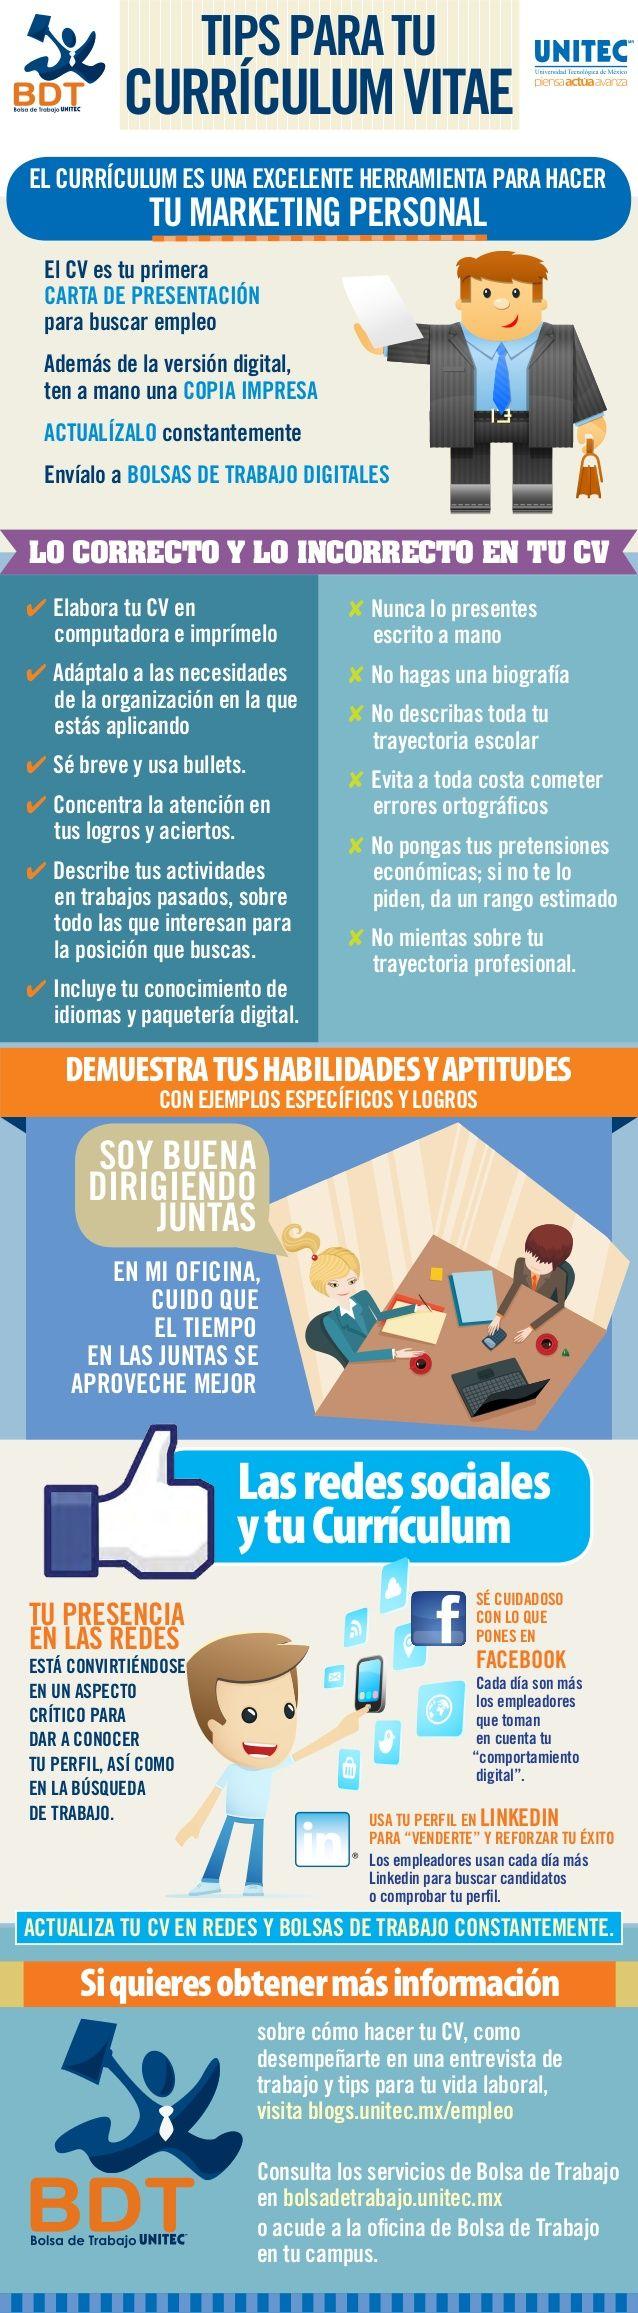 Tips para tu currículum vitae #egresados #estudiantes #umayor ...